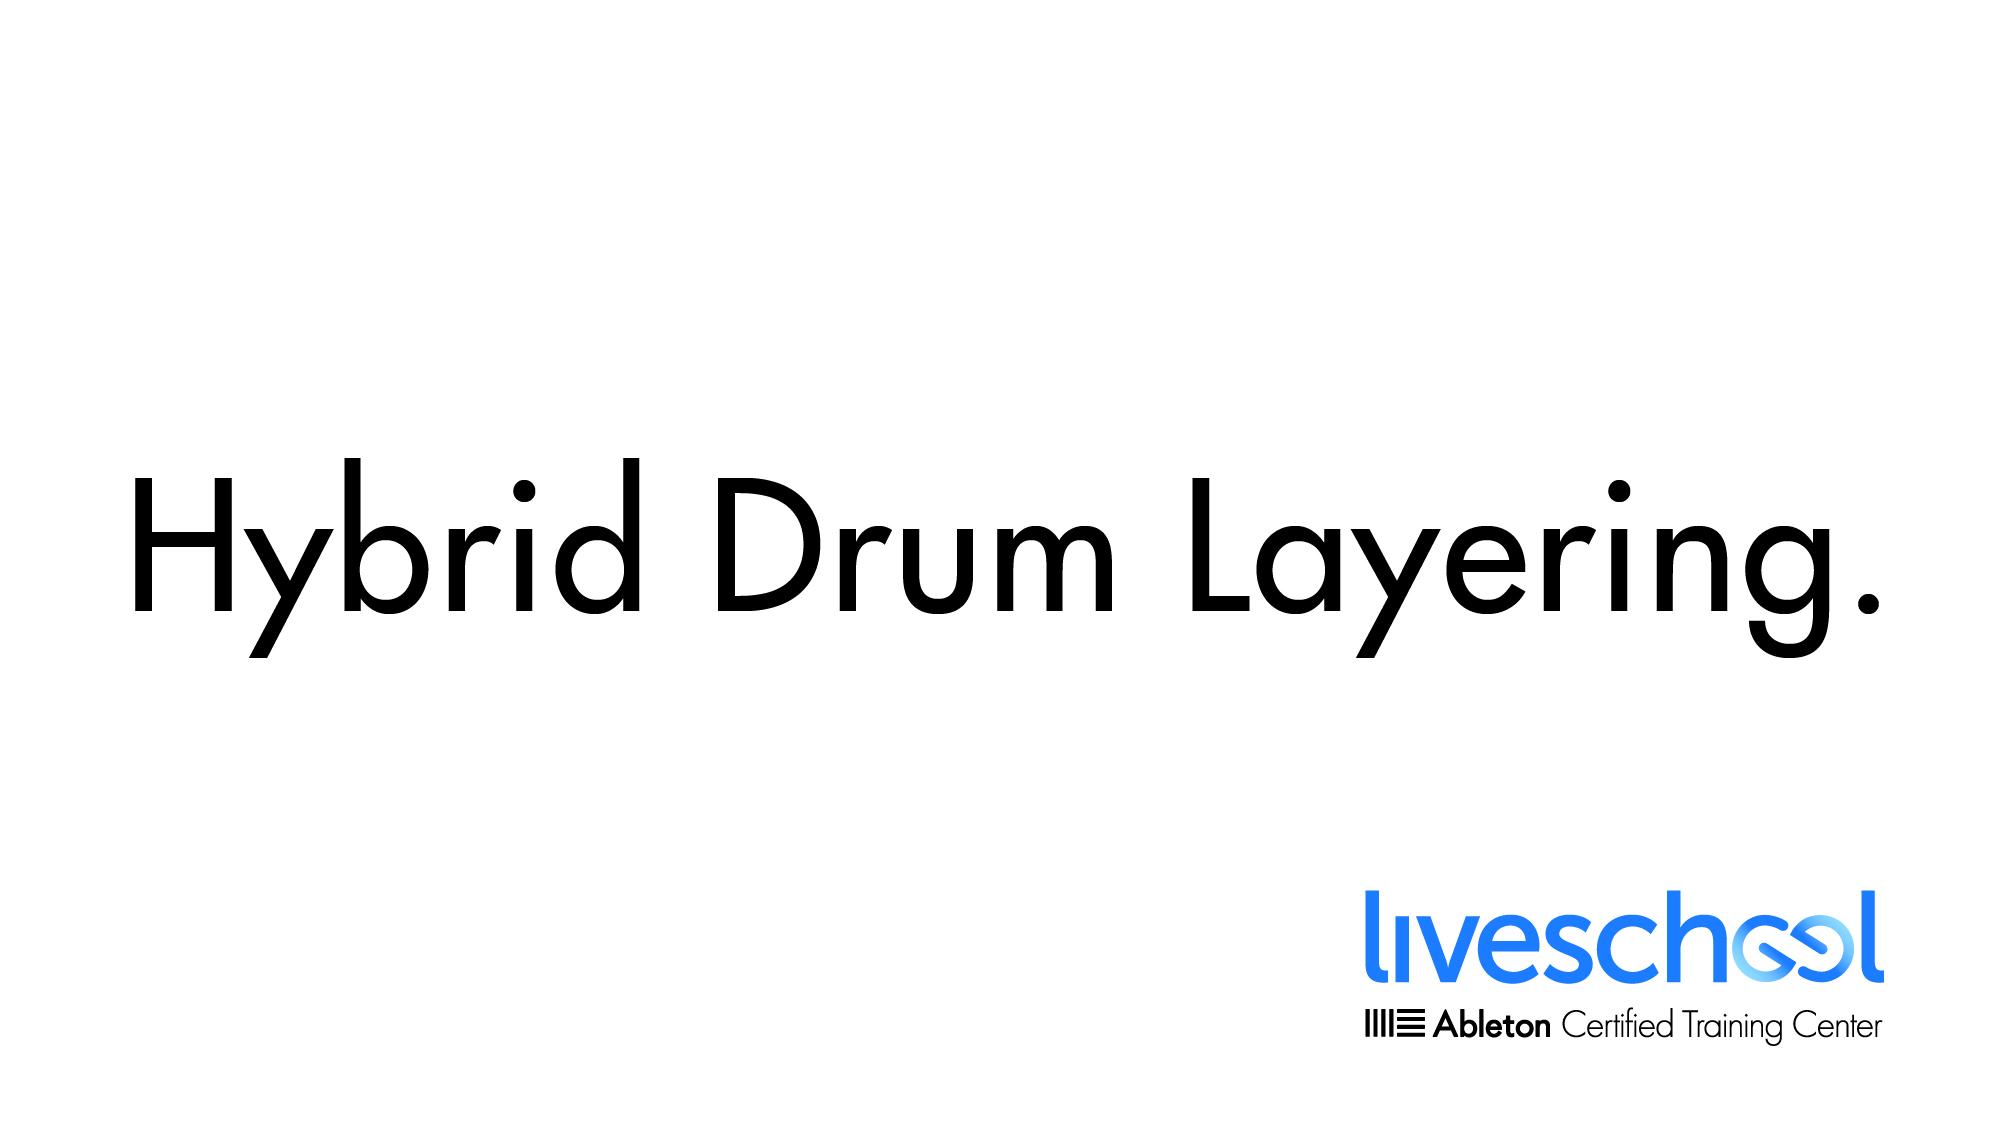 HybridDrumLayering-01